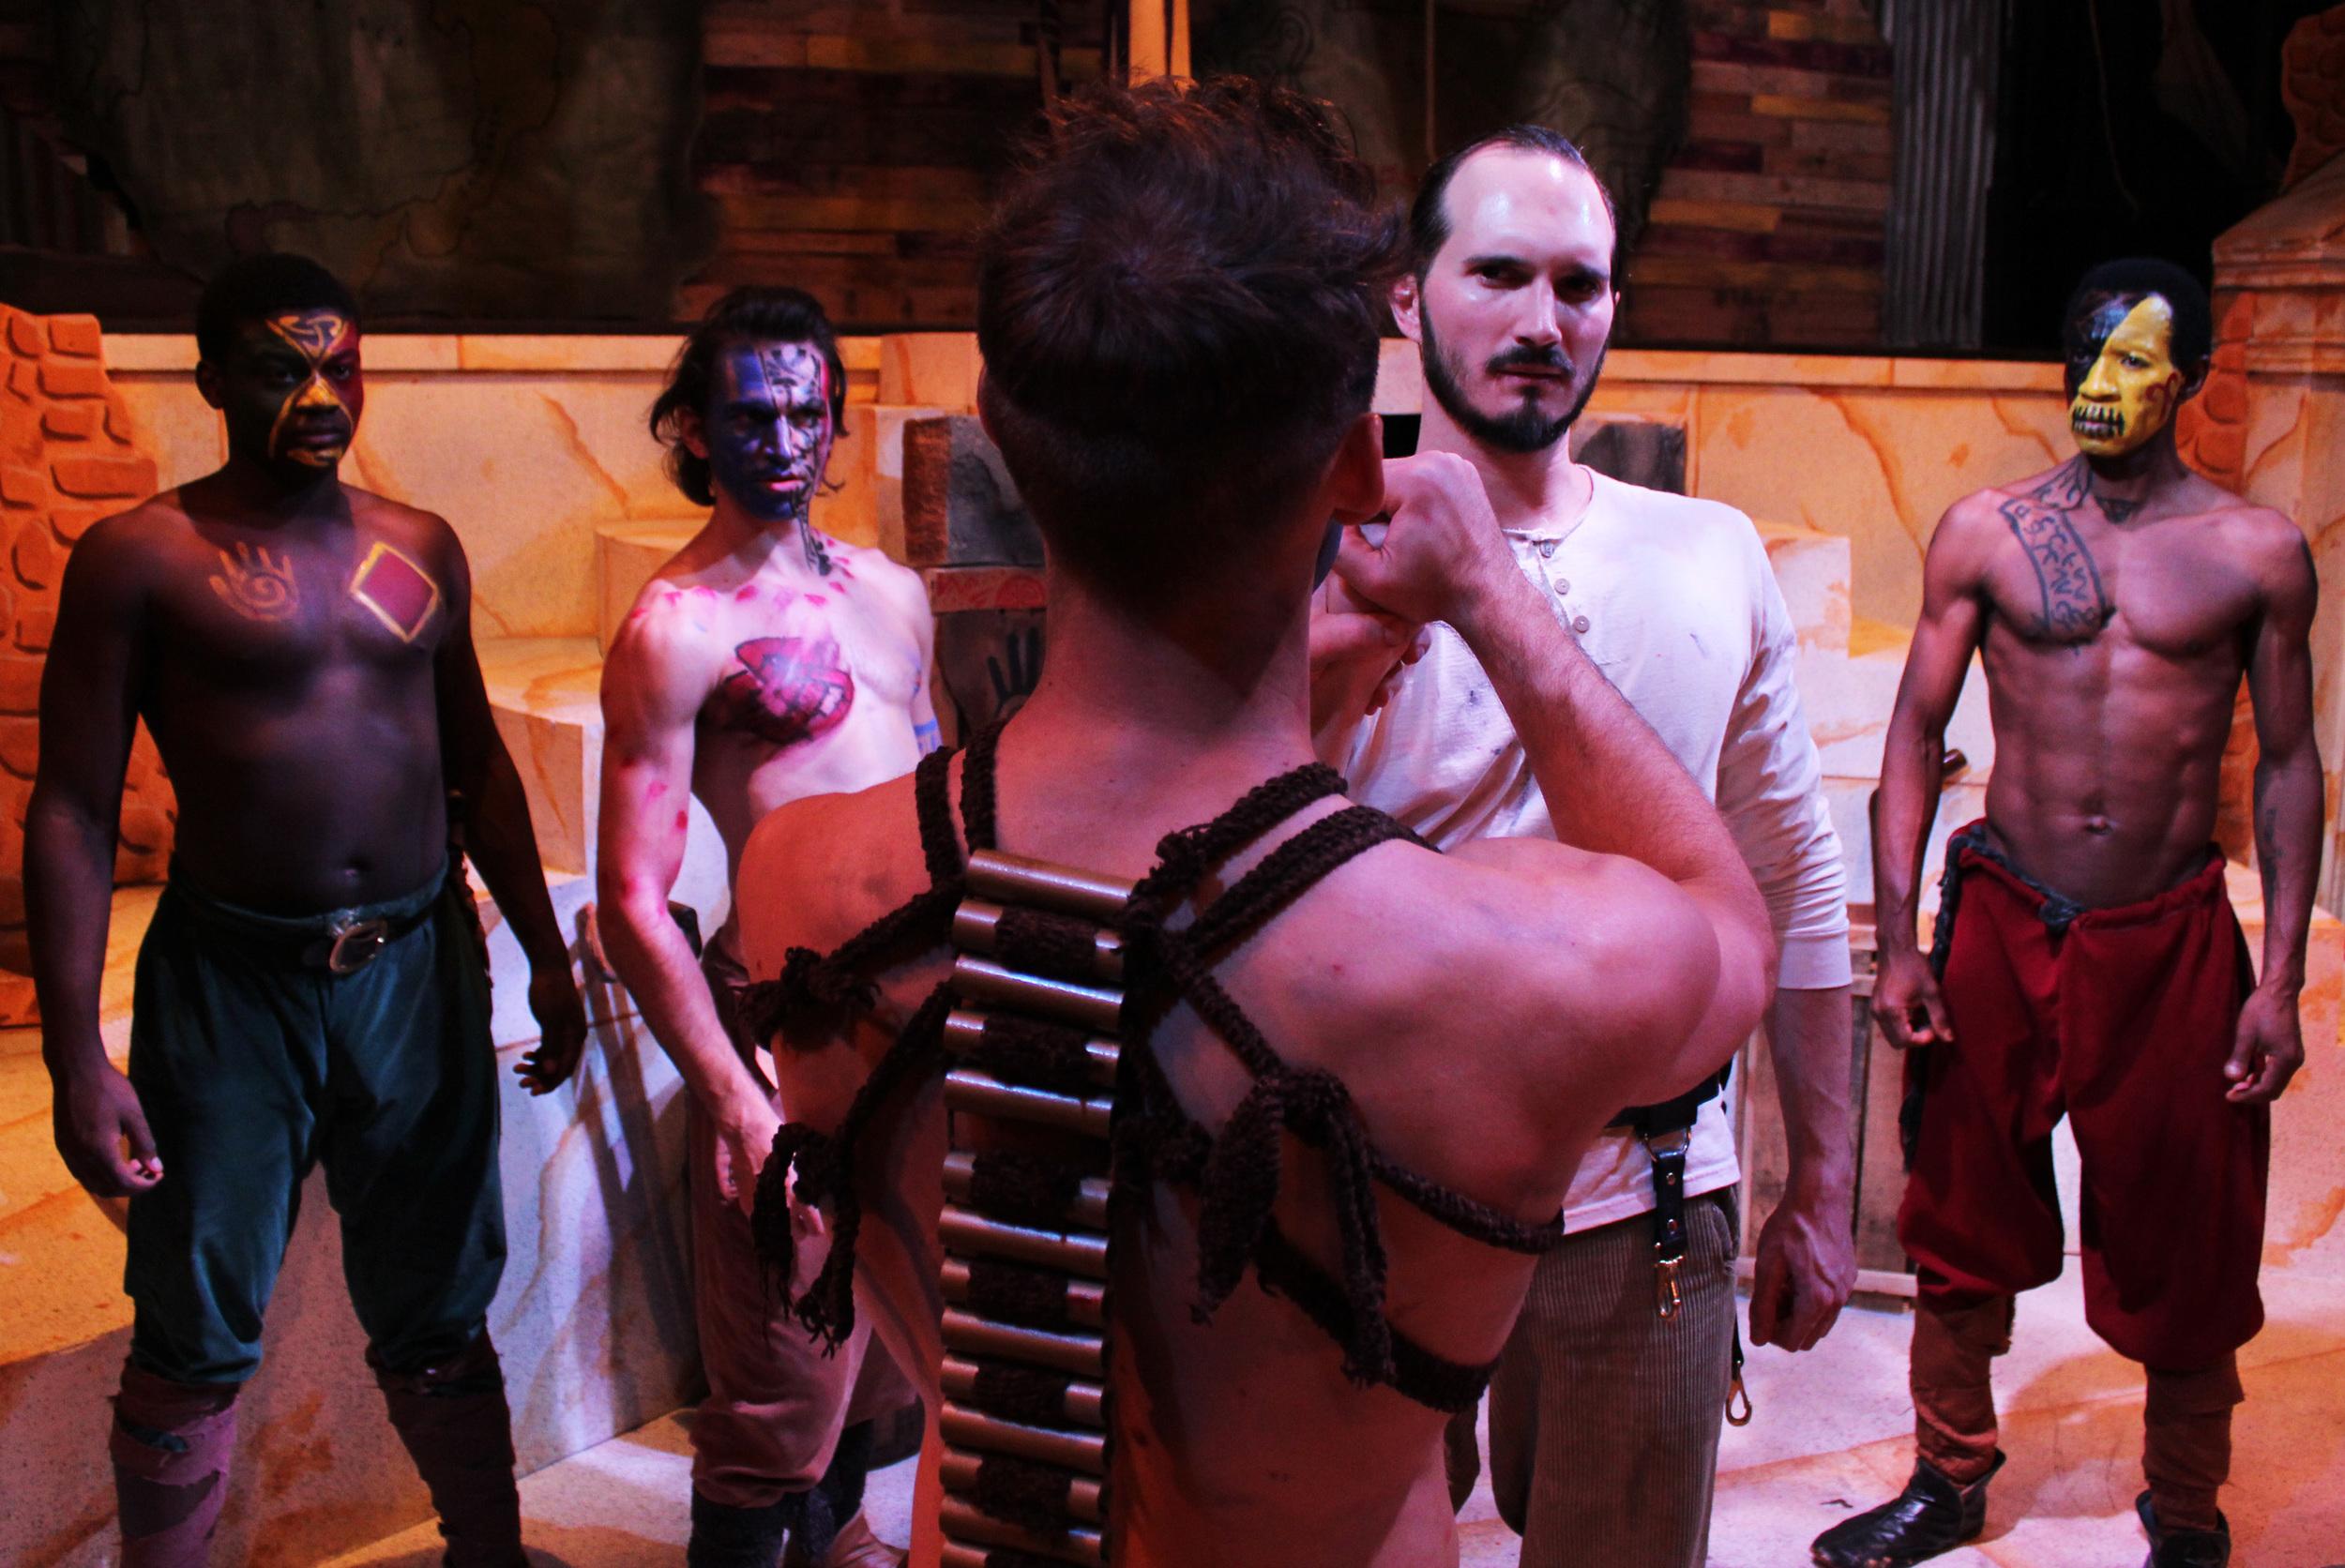 Volsce (Bernard Joseph), Volsce (Ben Koontz), Aufidius (Ian Potter), Coriolanus (Thomas Weaver), Volsce (Clem Onukwubiri)